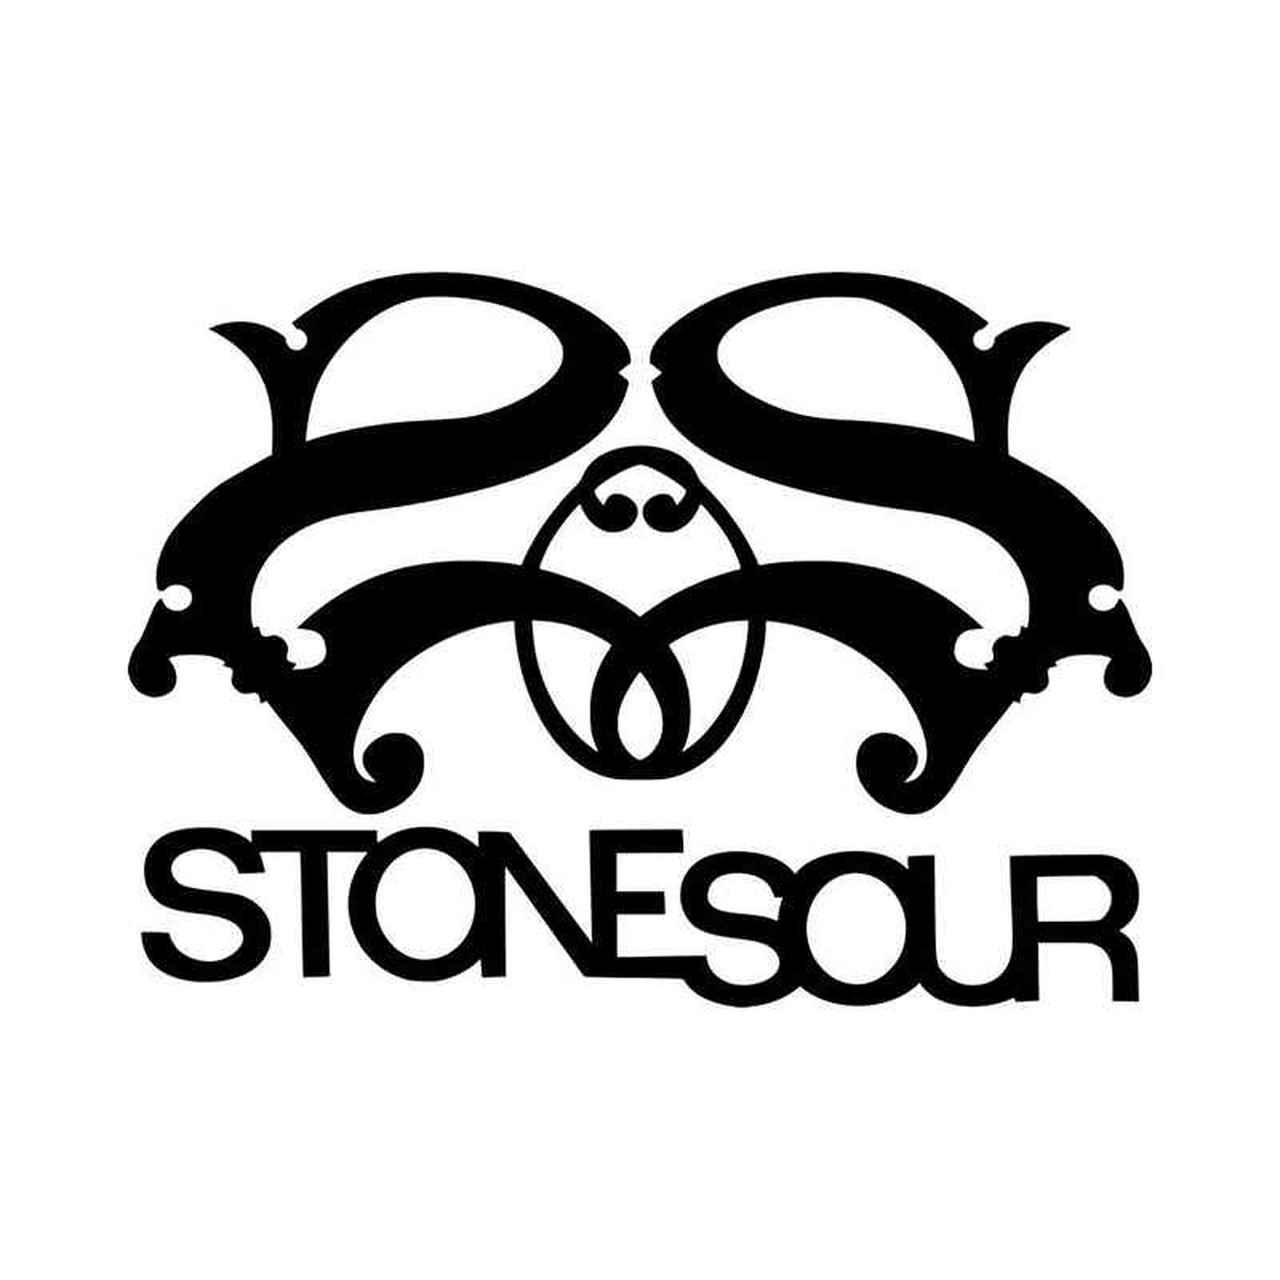 Stone Sour Band Logo Vinyl Decal Sticker.